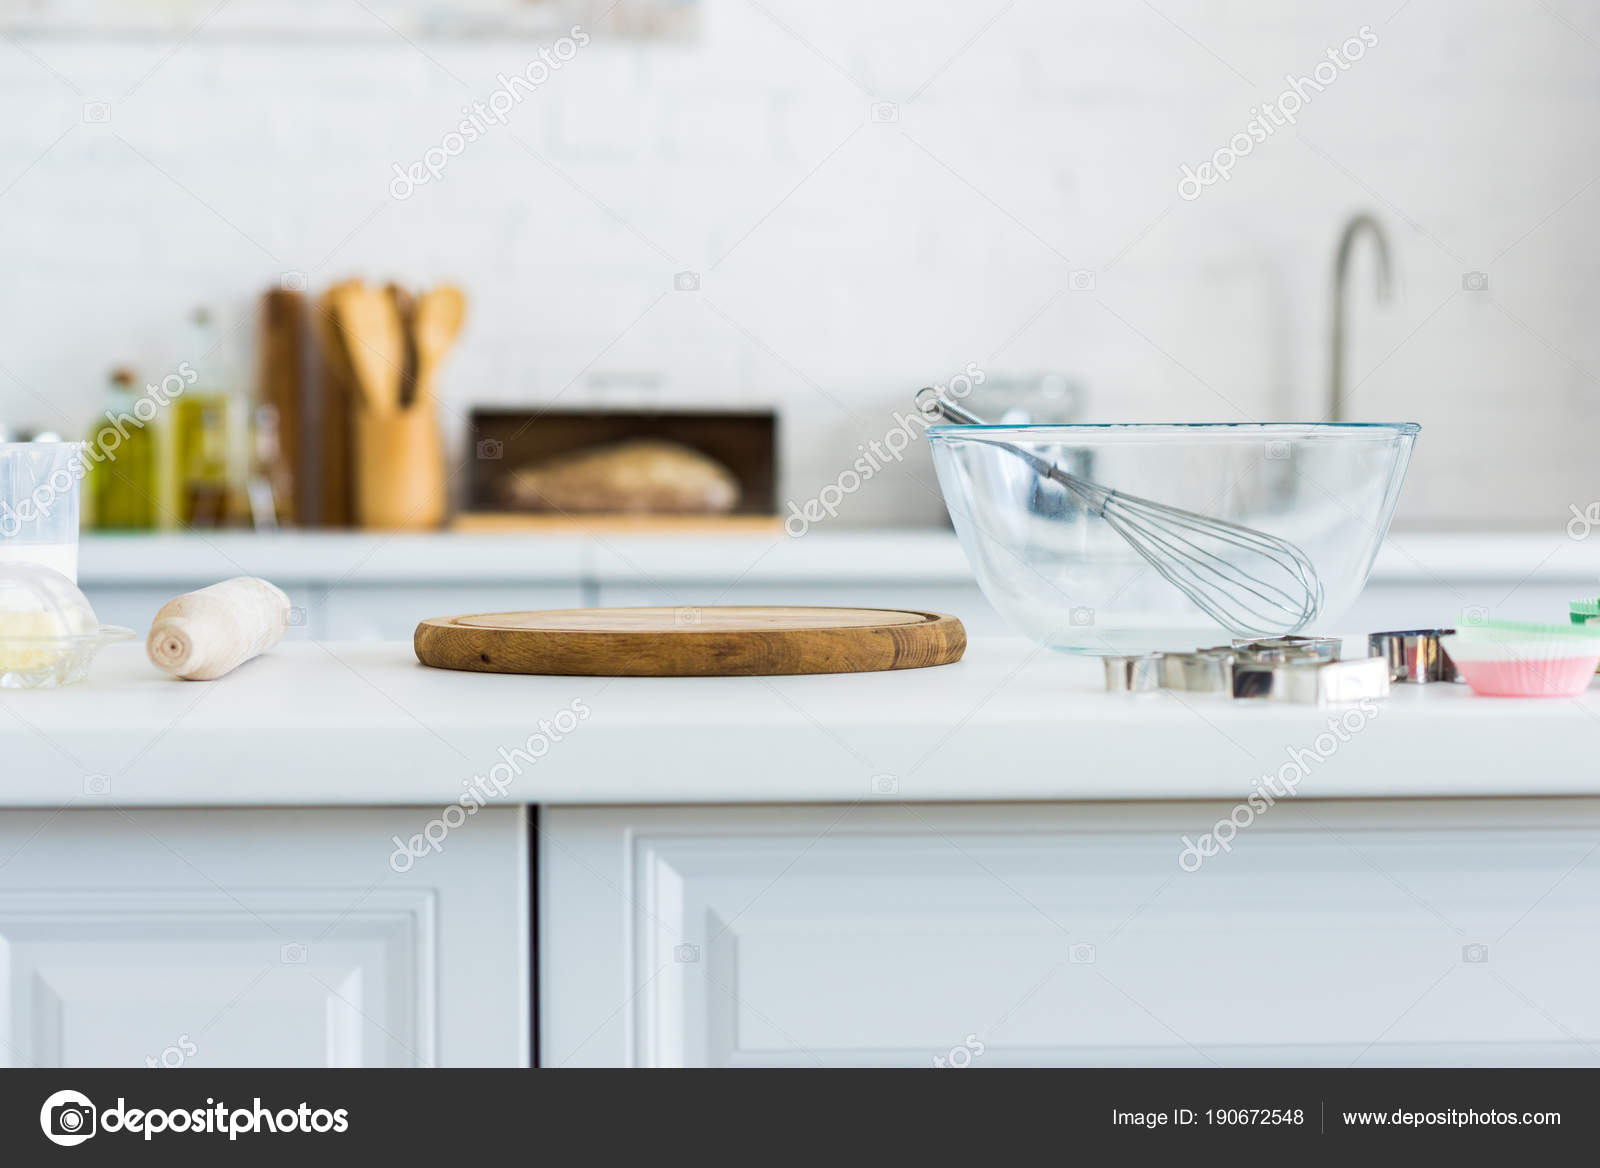 kitchen counters metal table sets 厨房柜台上的滚针切板和碗 图库照片 c igorvetushko 190672548